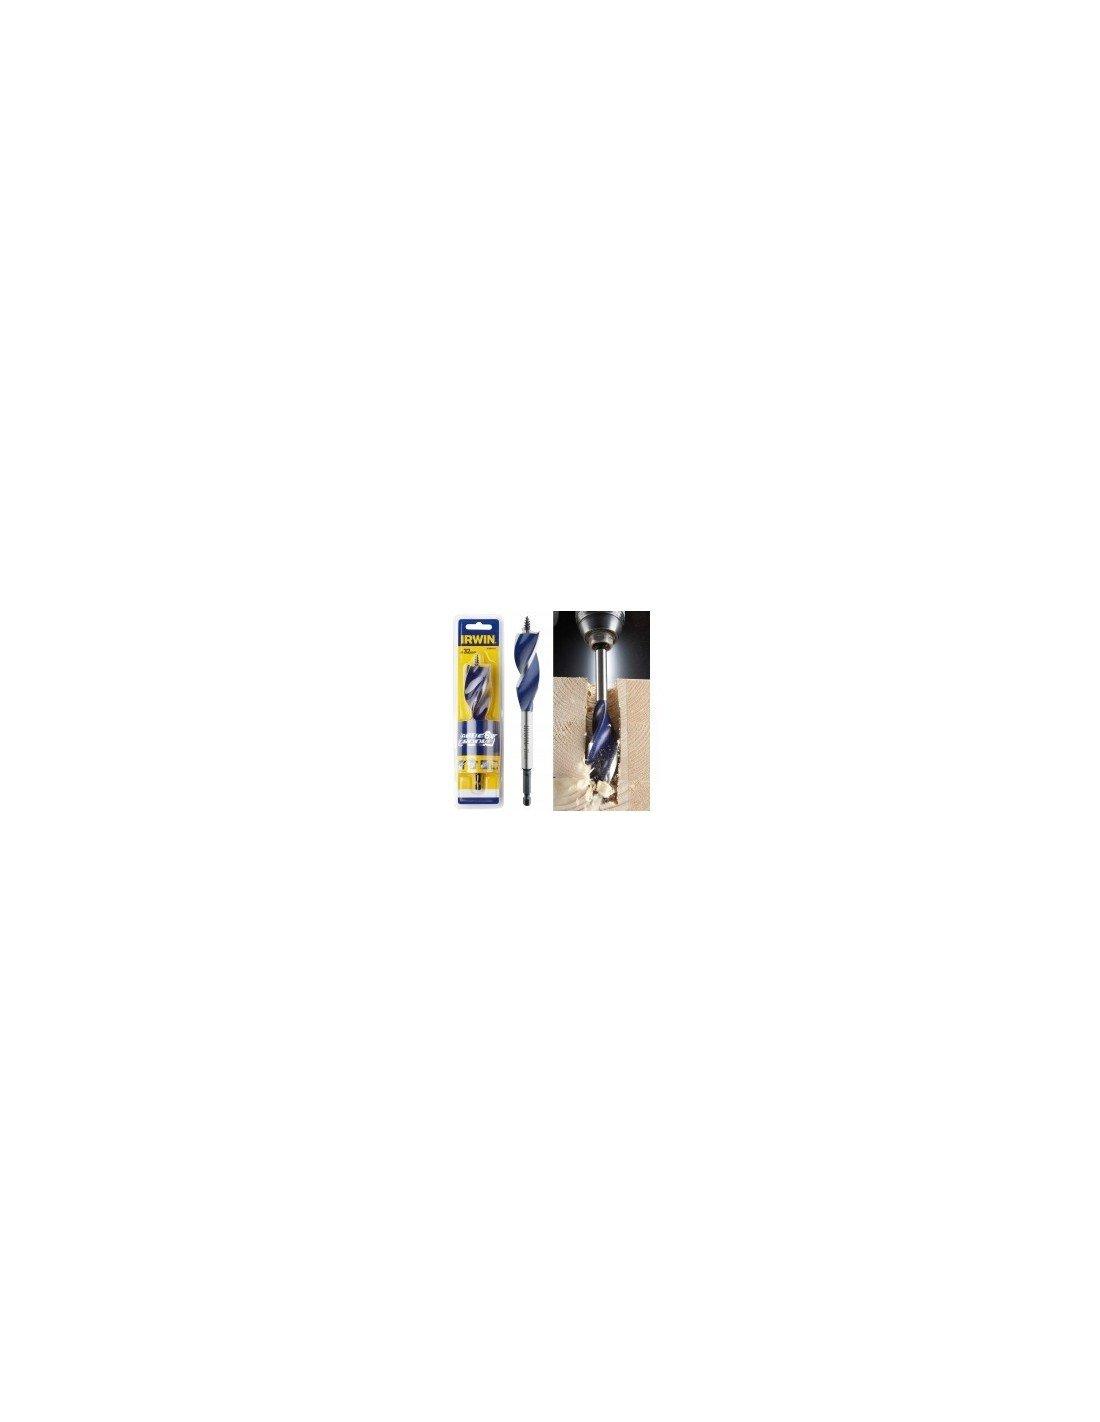 IRWIN 1921991 6X Blue Groove Stubby Wood Bit 16 mm x 4-Inch